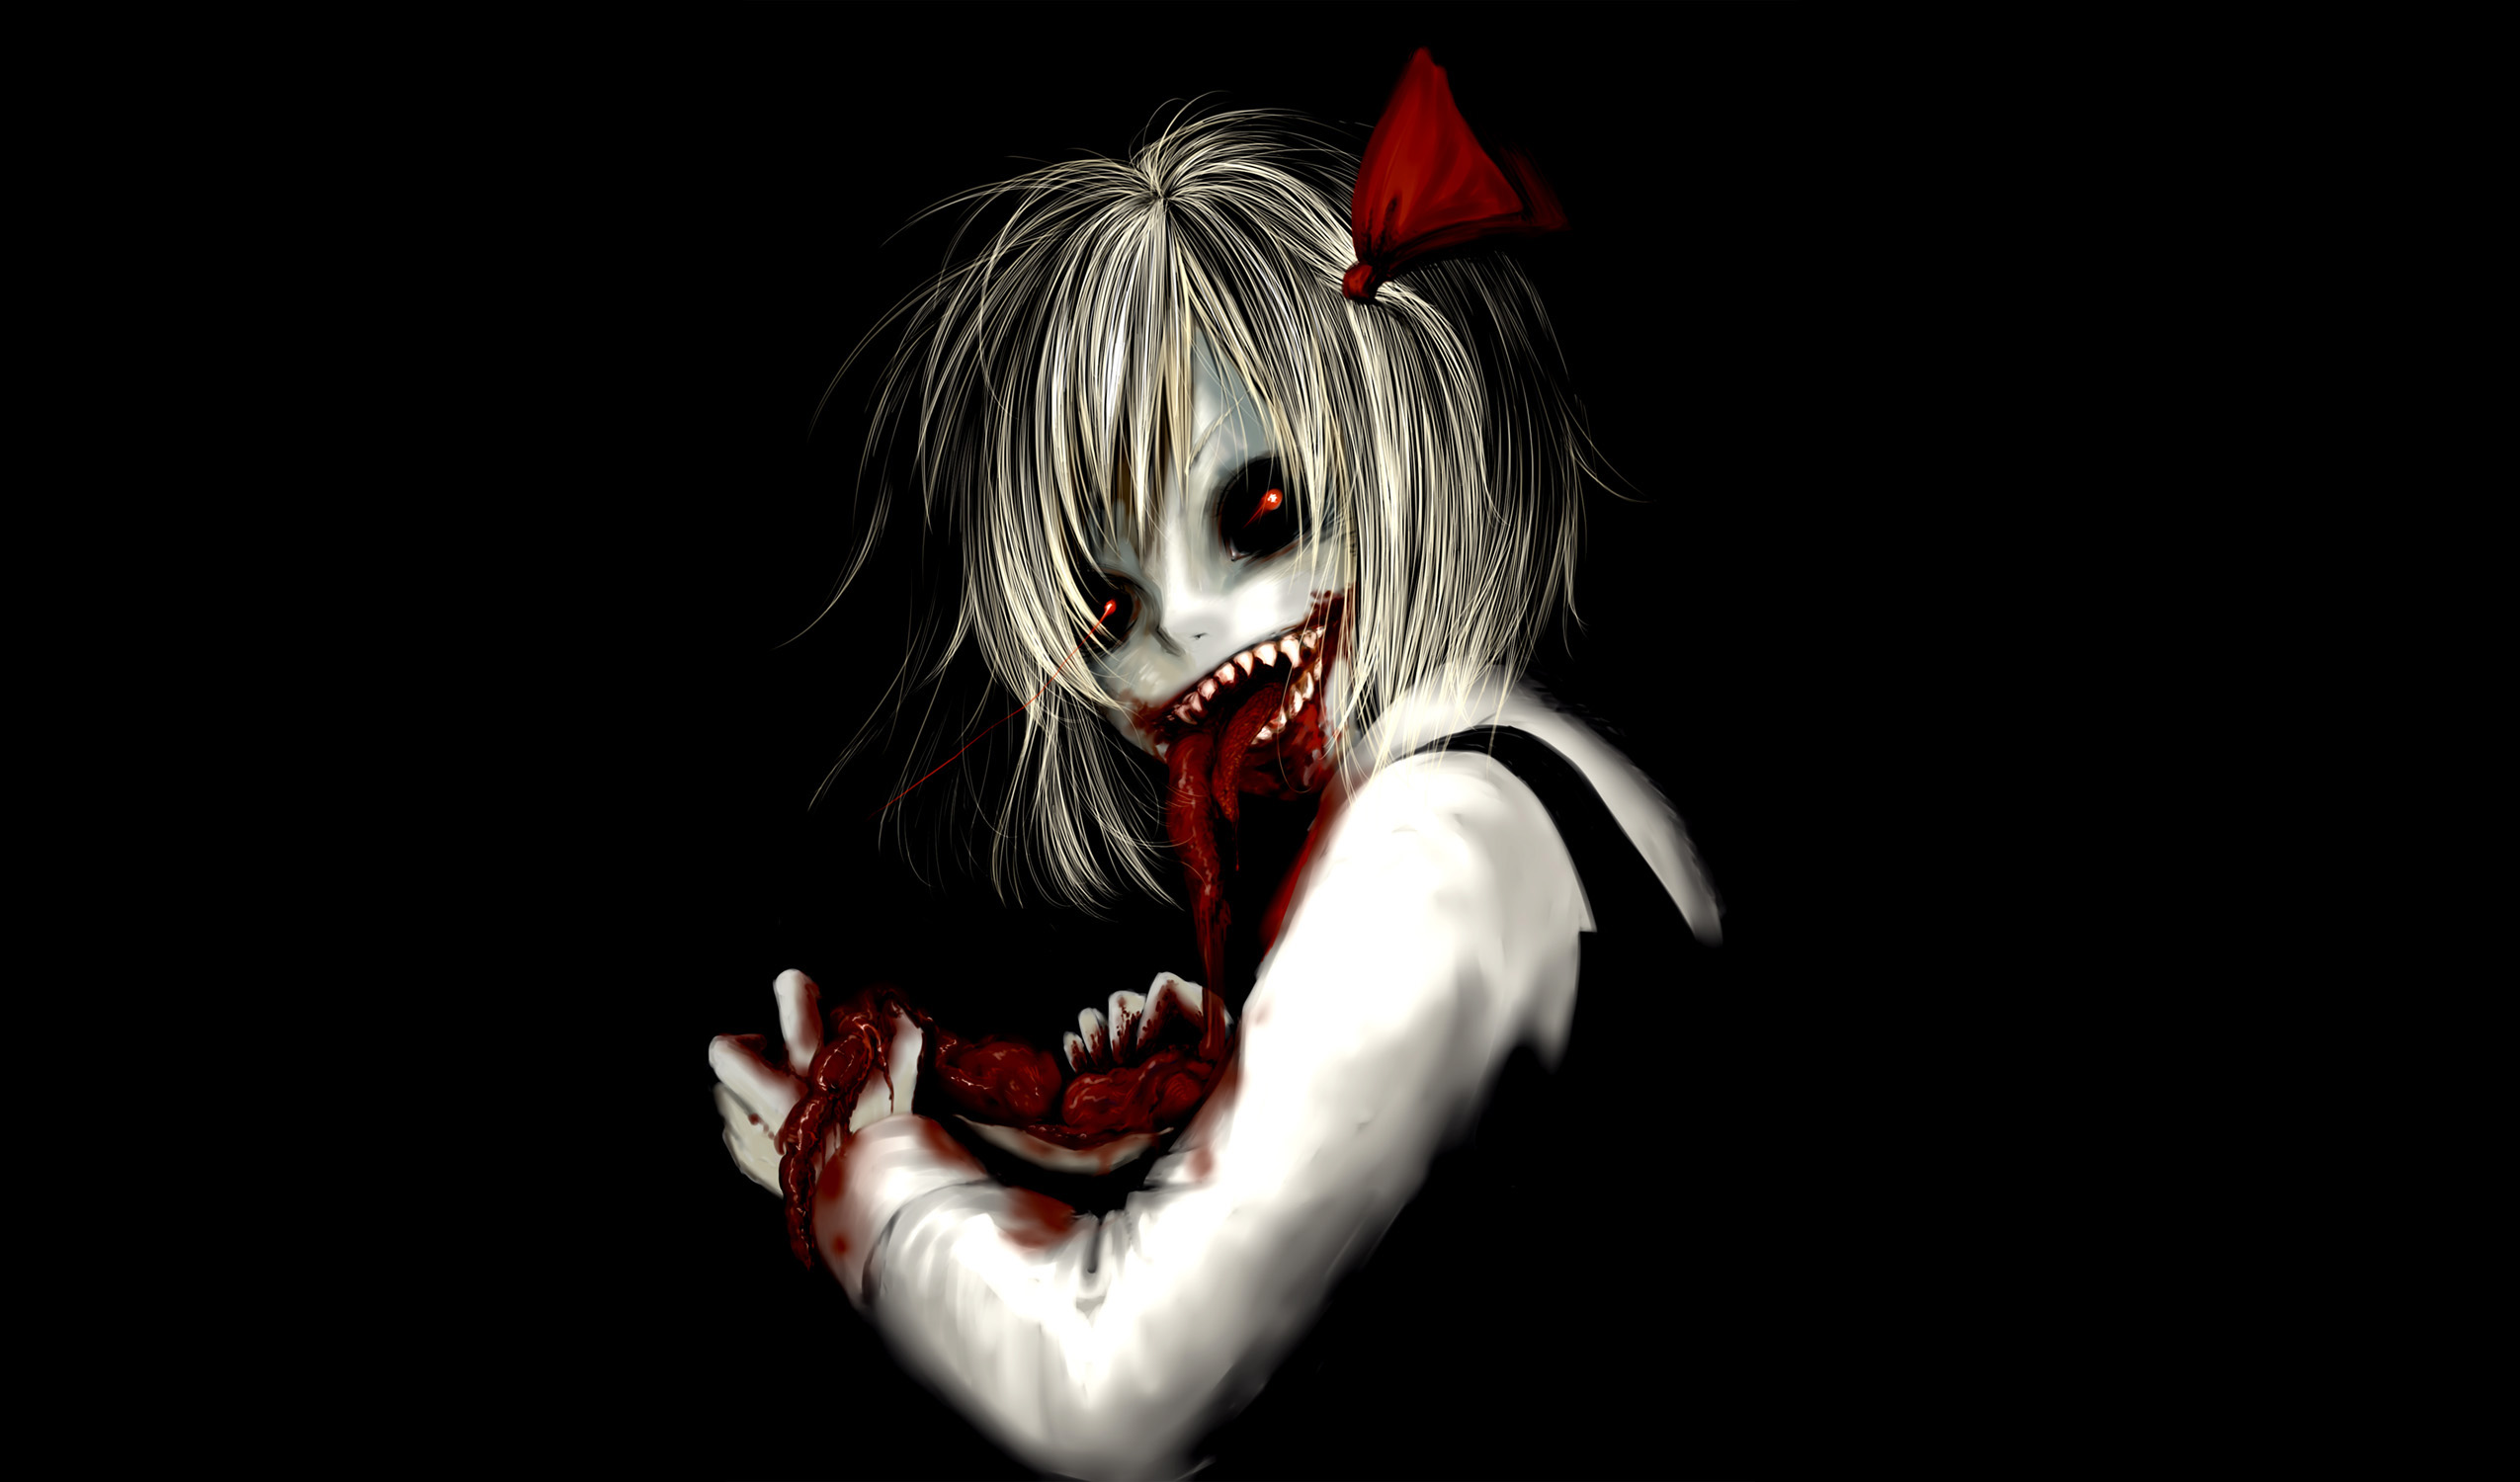 45+ Cool Dark Anime Wallpaper on WallpaperSafari